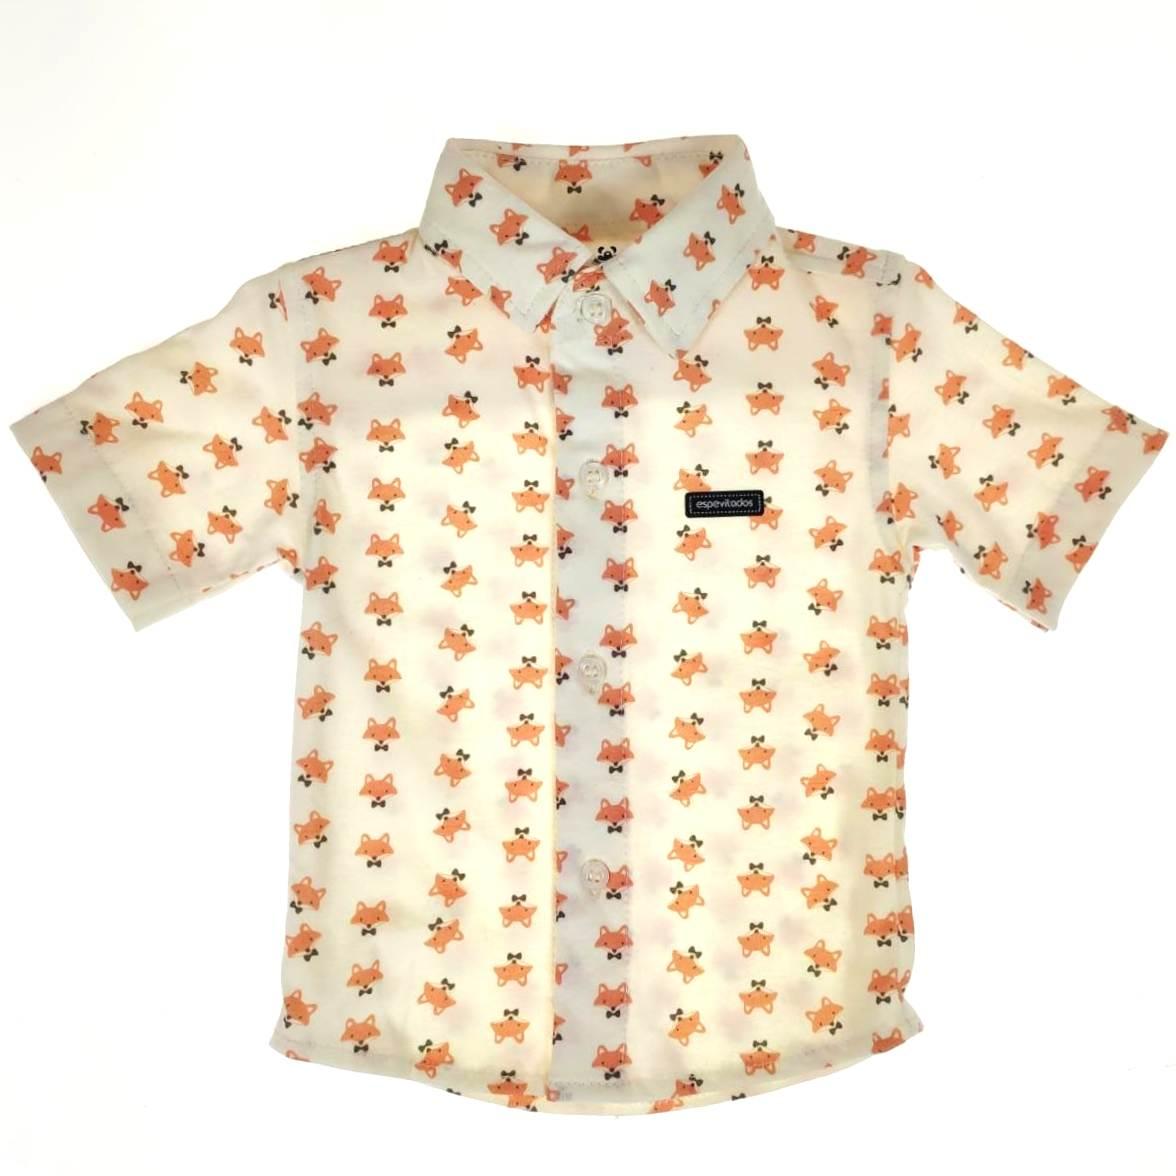 Camisa Curta Cru de Raposinhas